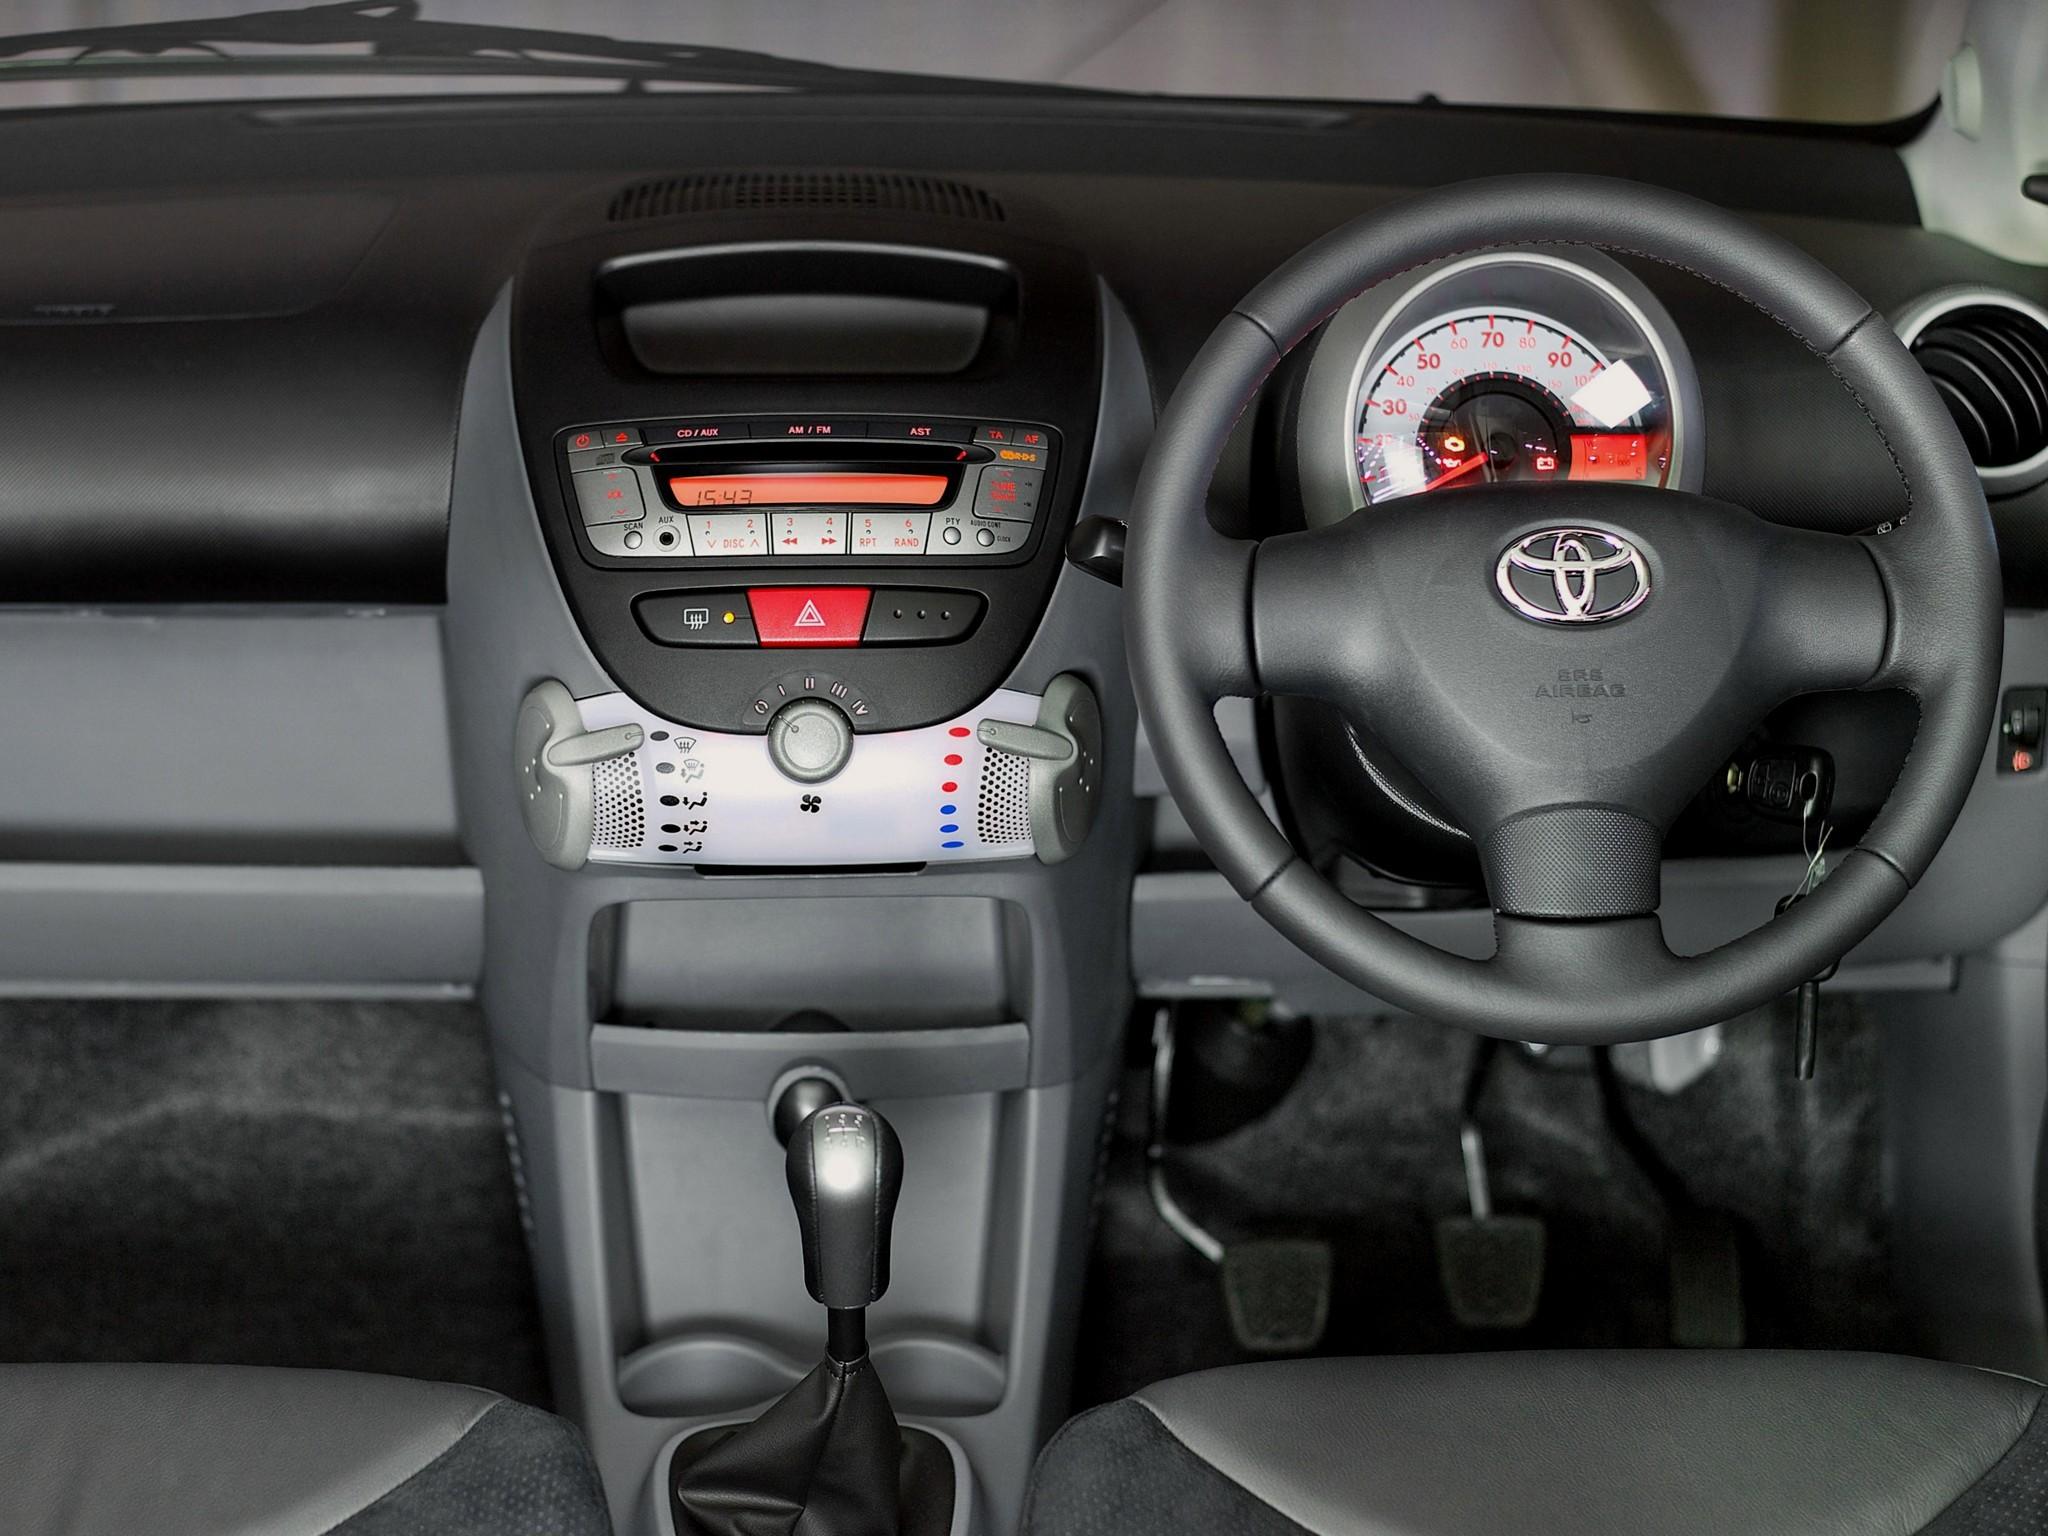 Toyota aygo 3 doors 2009 2010 2011 2012 2013 2014 autoevolution - Toyota aygo interior ...